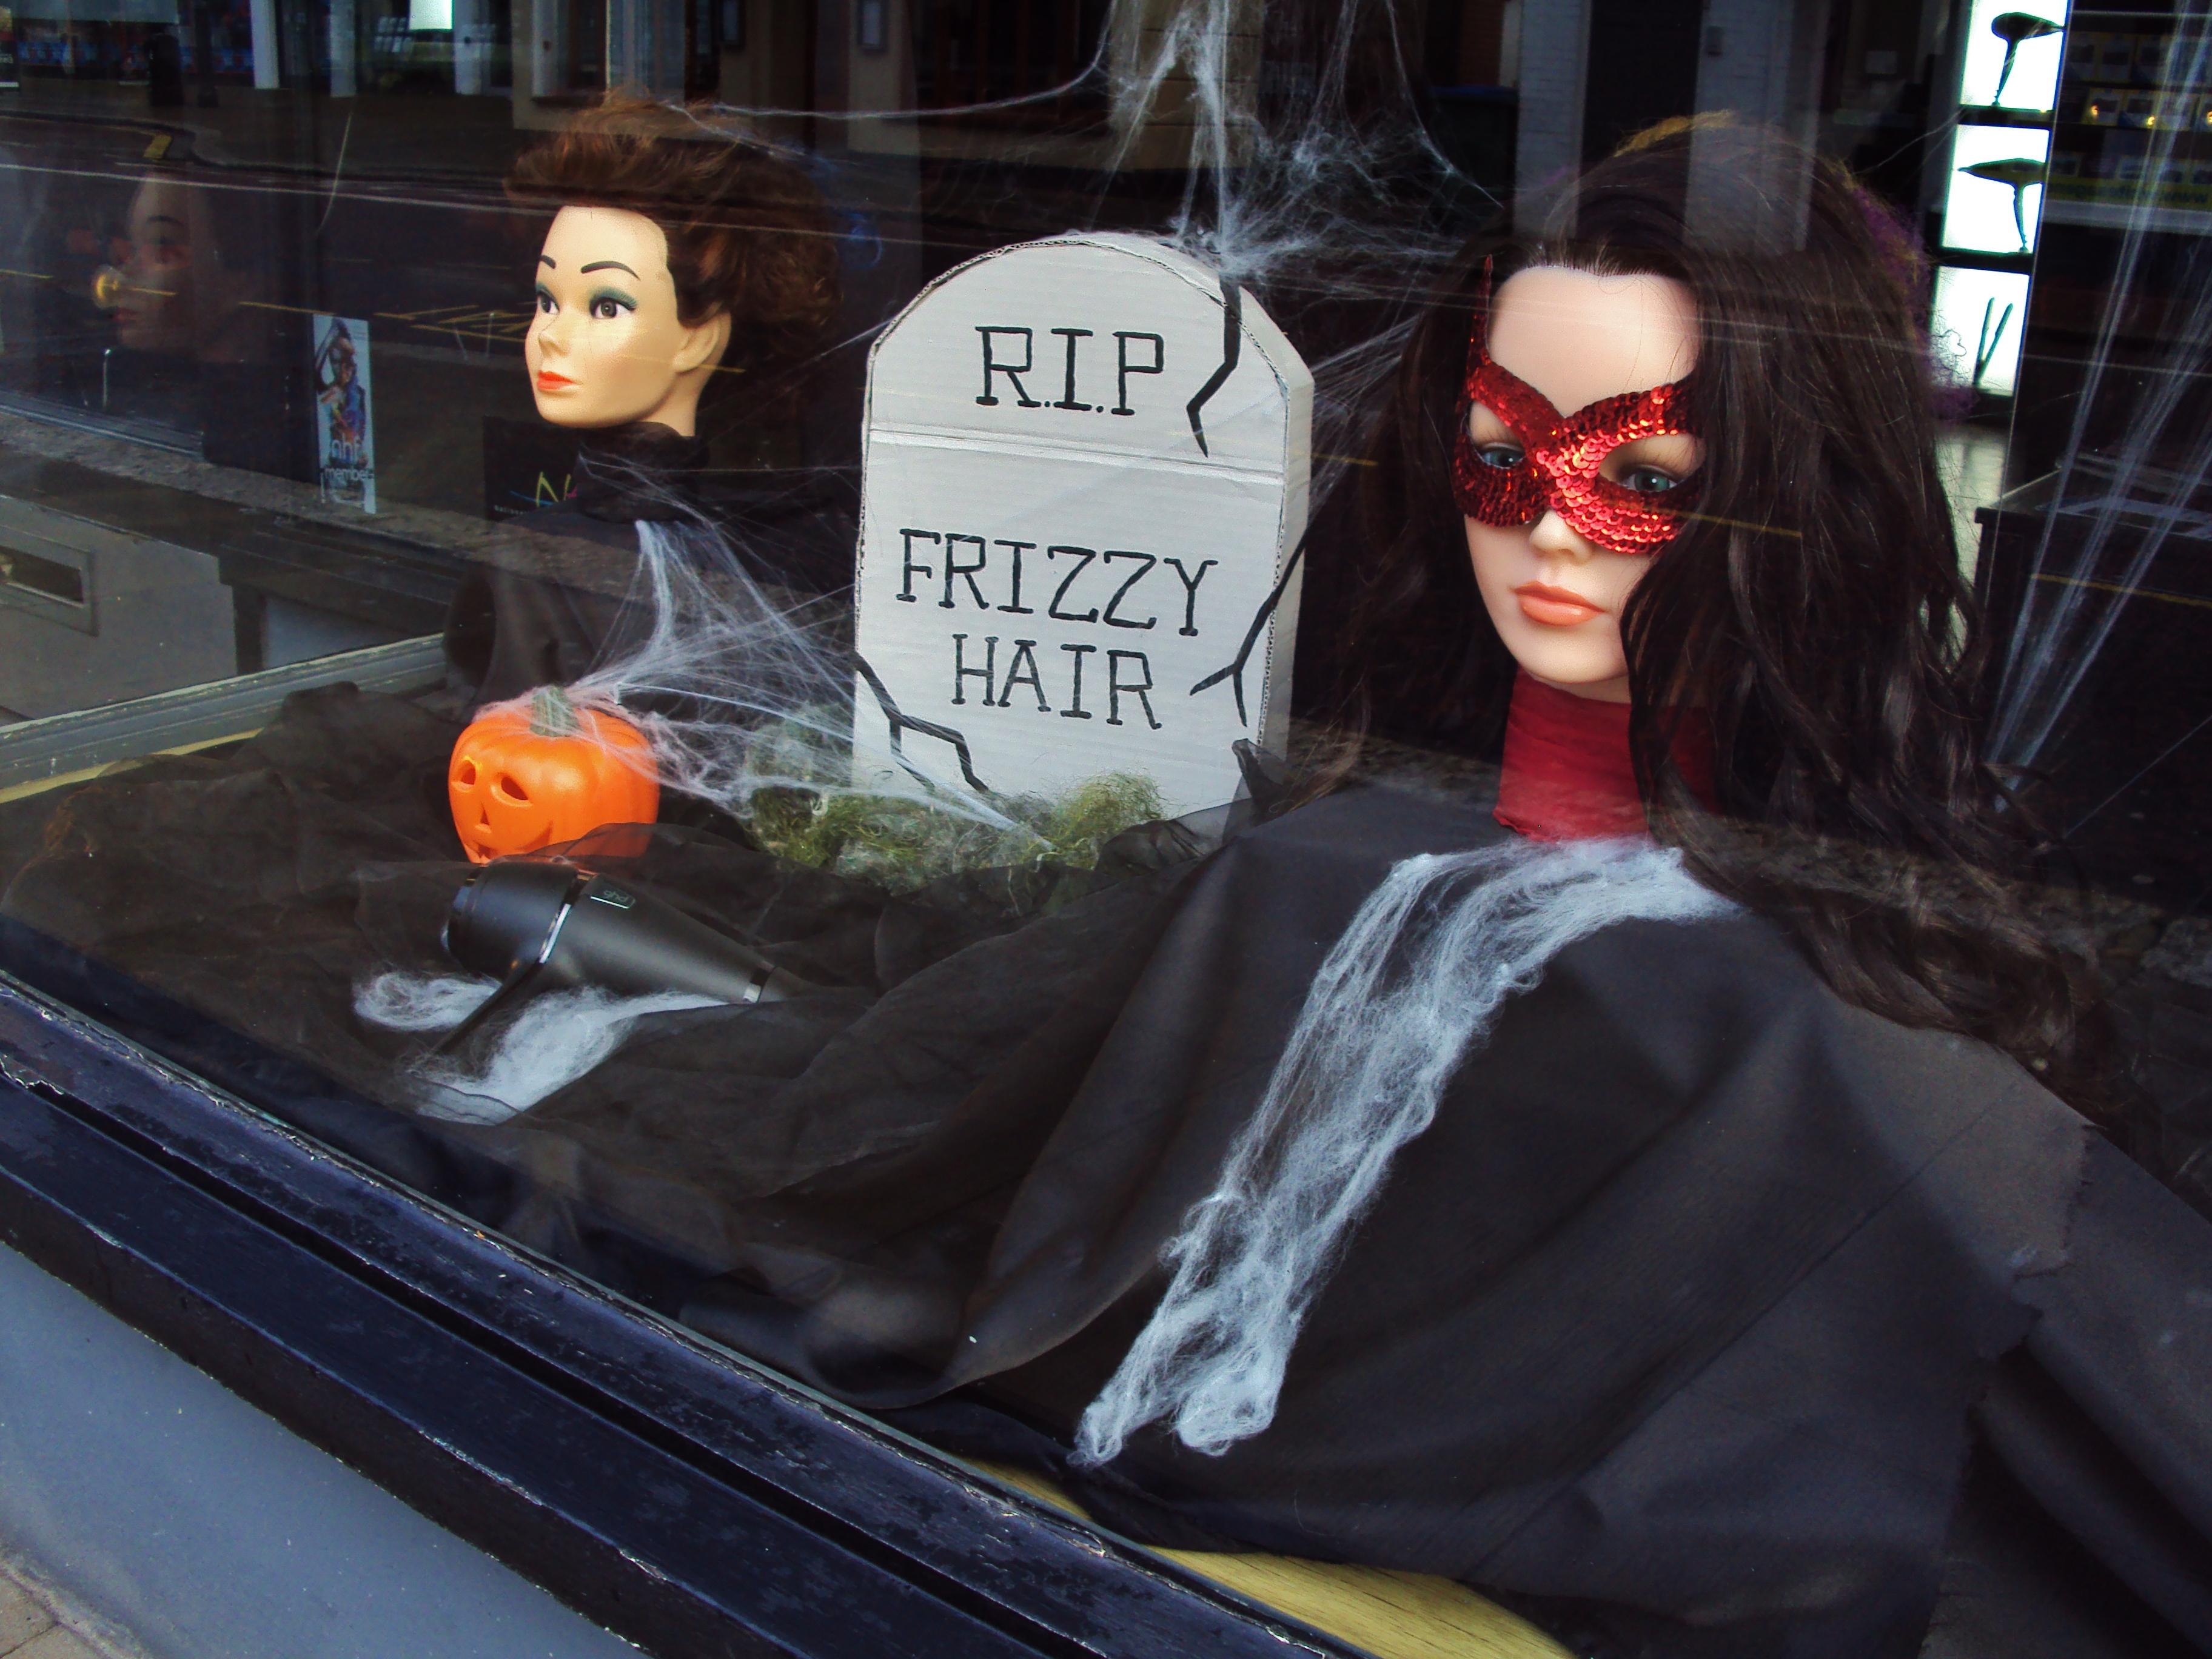 Halloween Shop Displays.Eeek Halloween Shop Window Displays In West Street Fareham